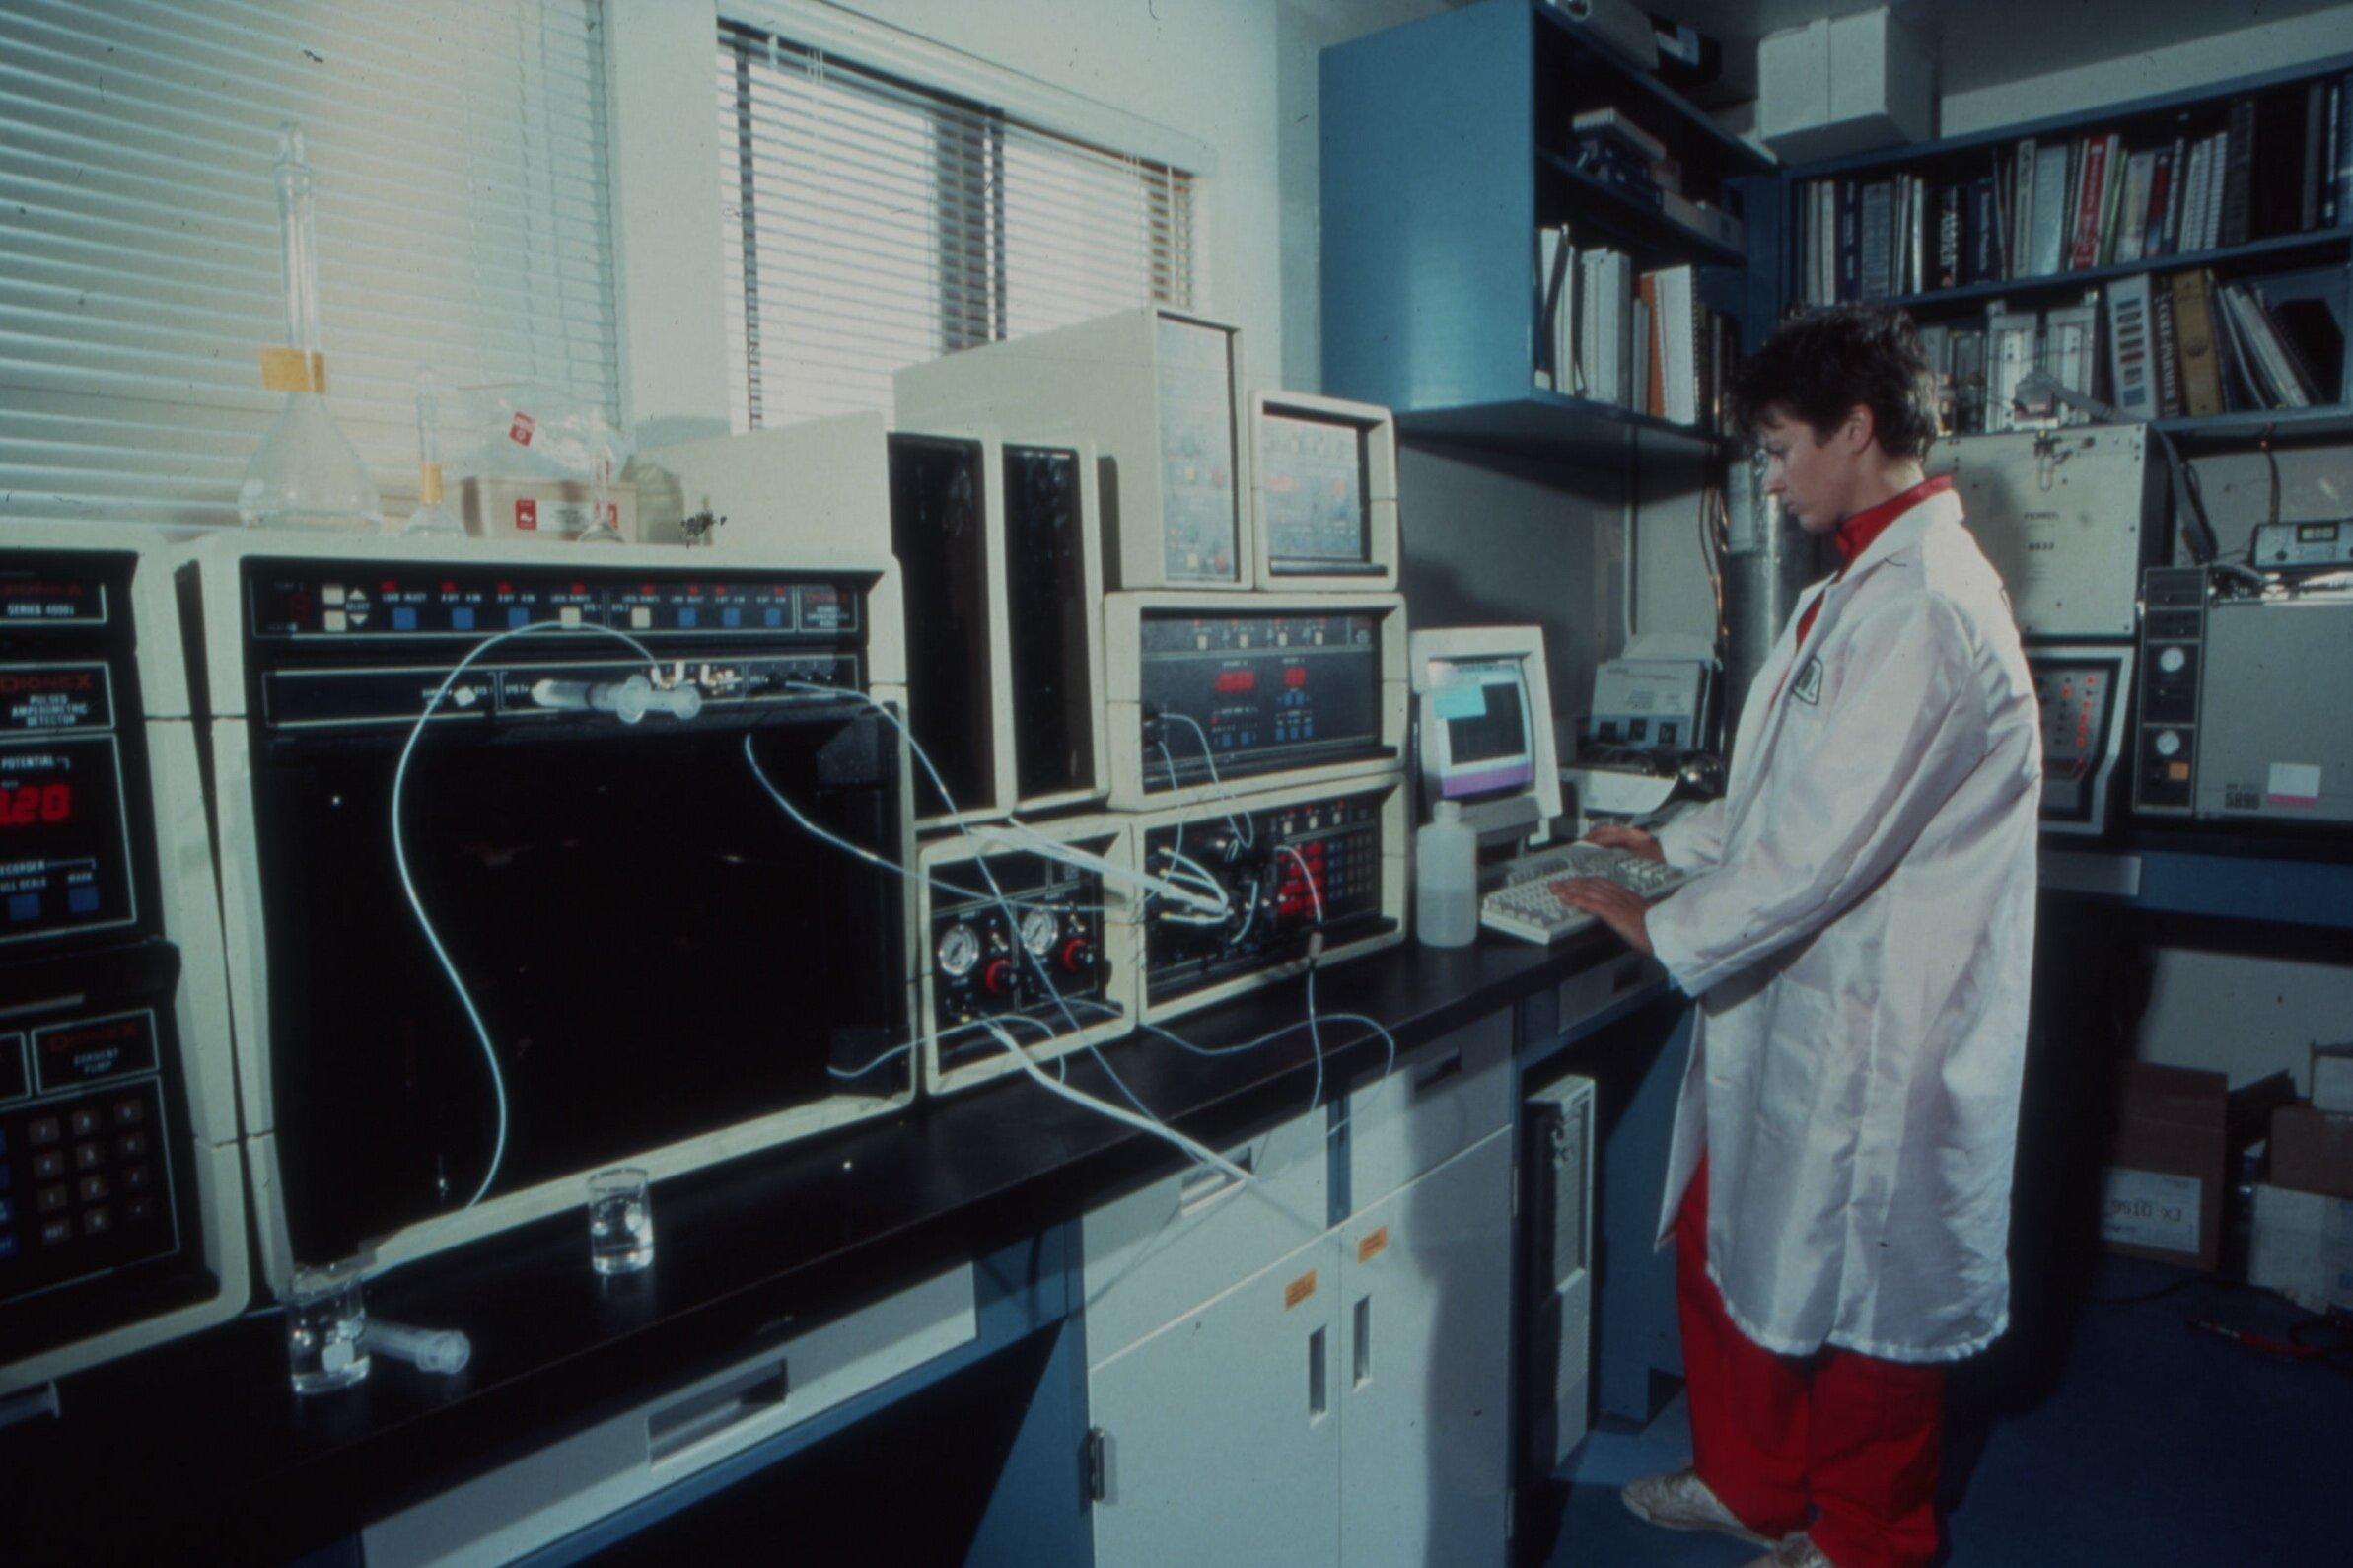 Biospherian logging data in the Biosphere 2